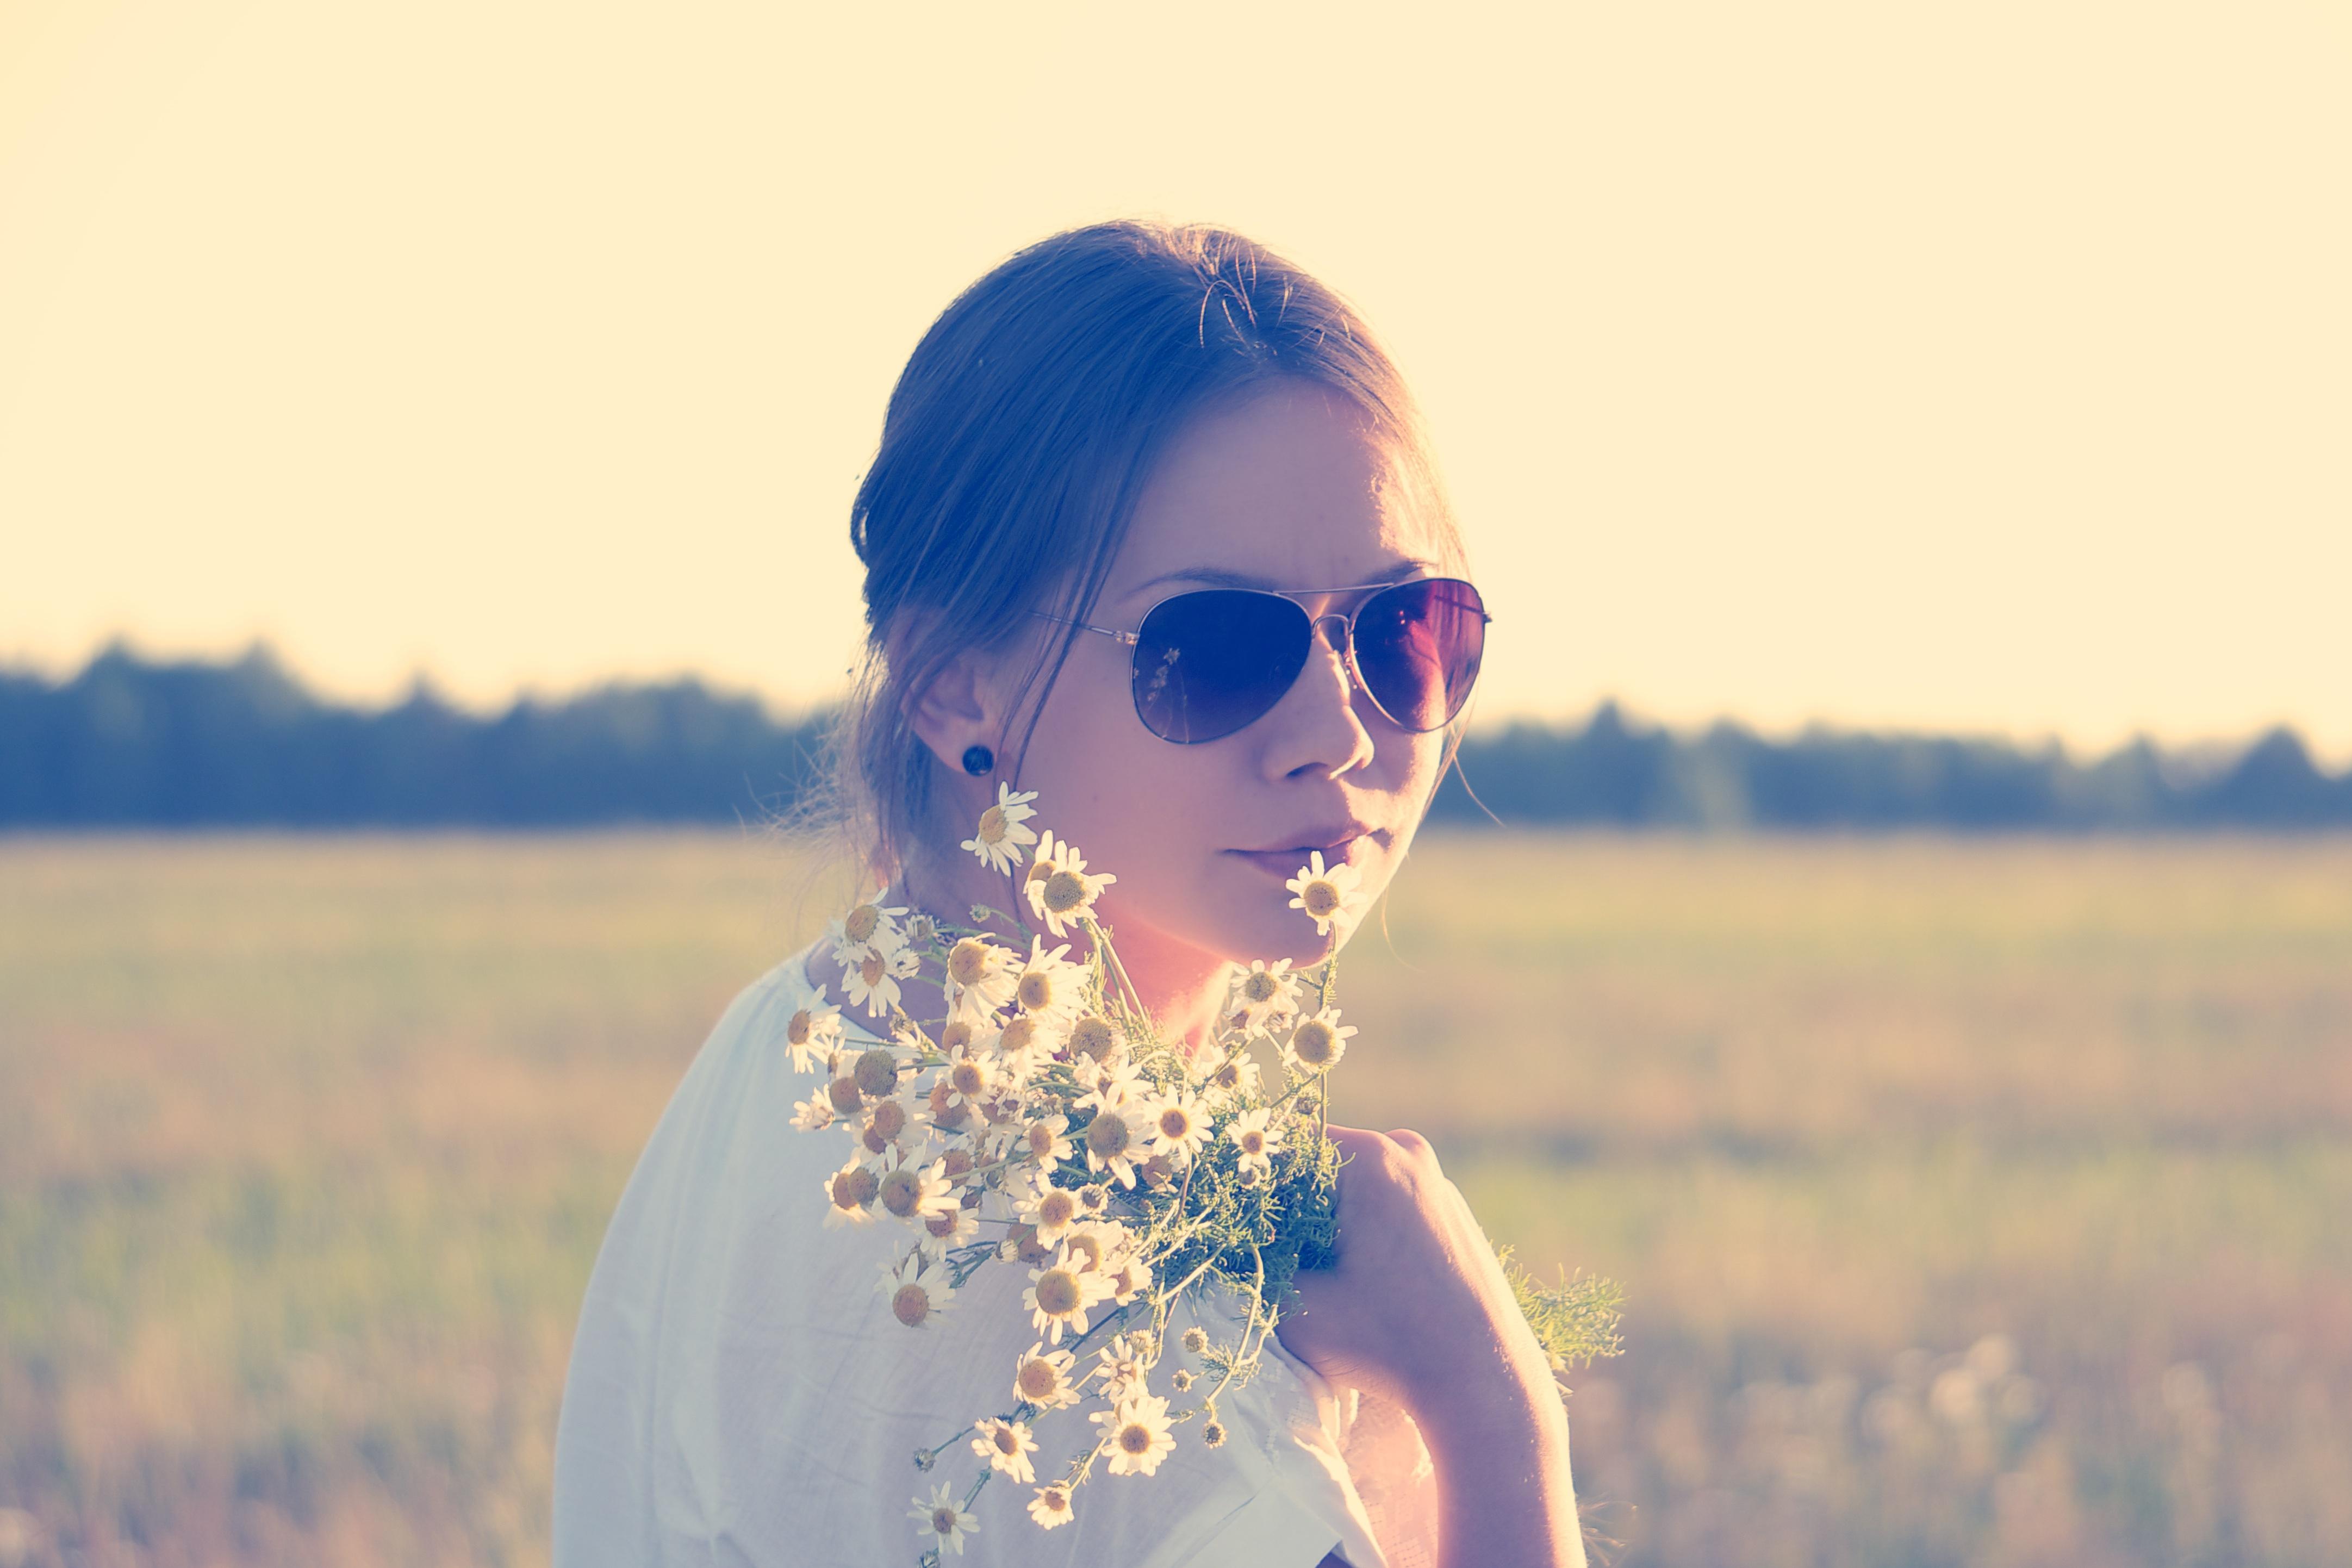 White flowers, Beauty, Field, Flower, Girl, HQ Photo